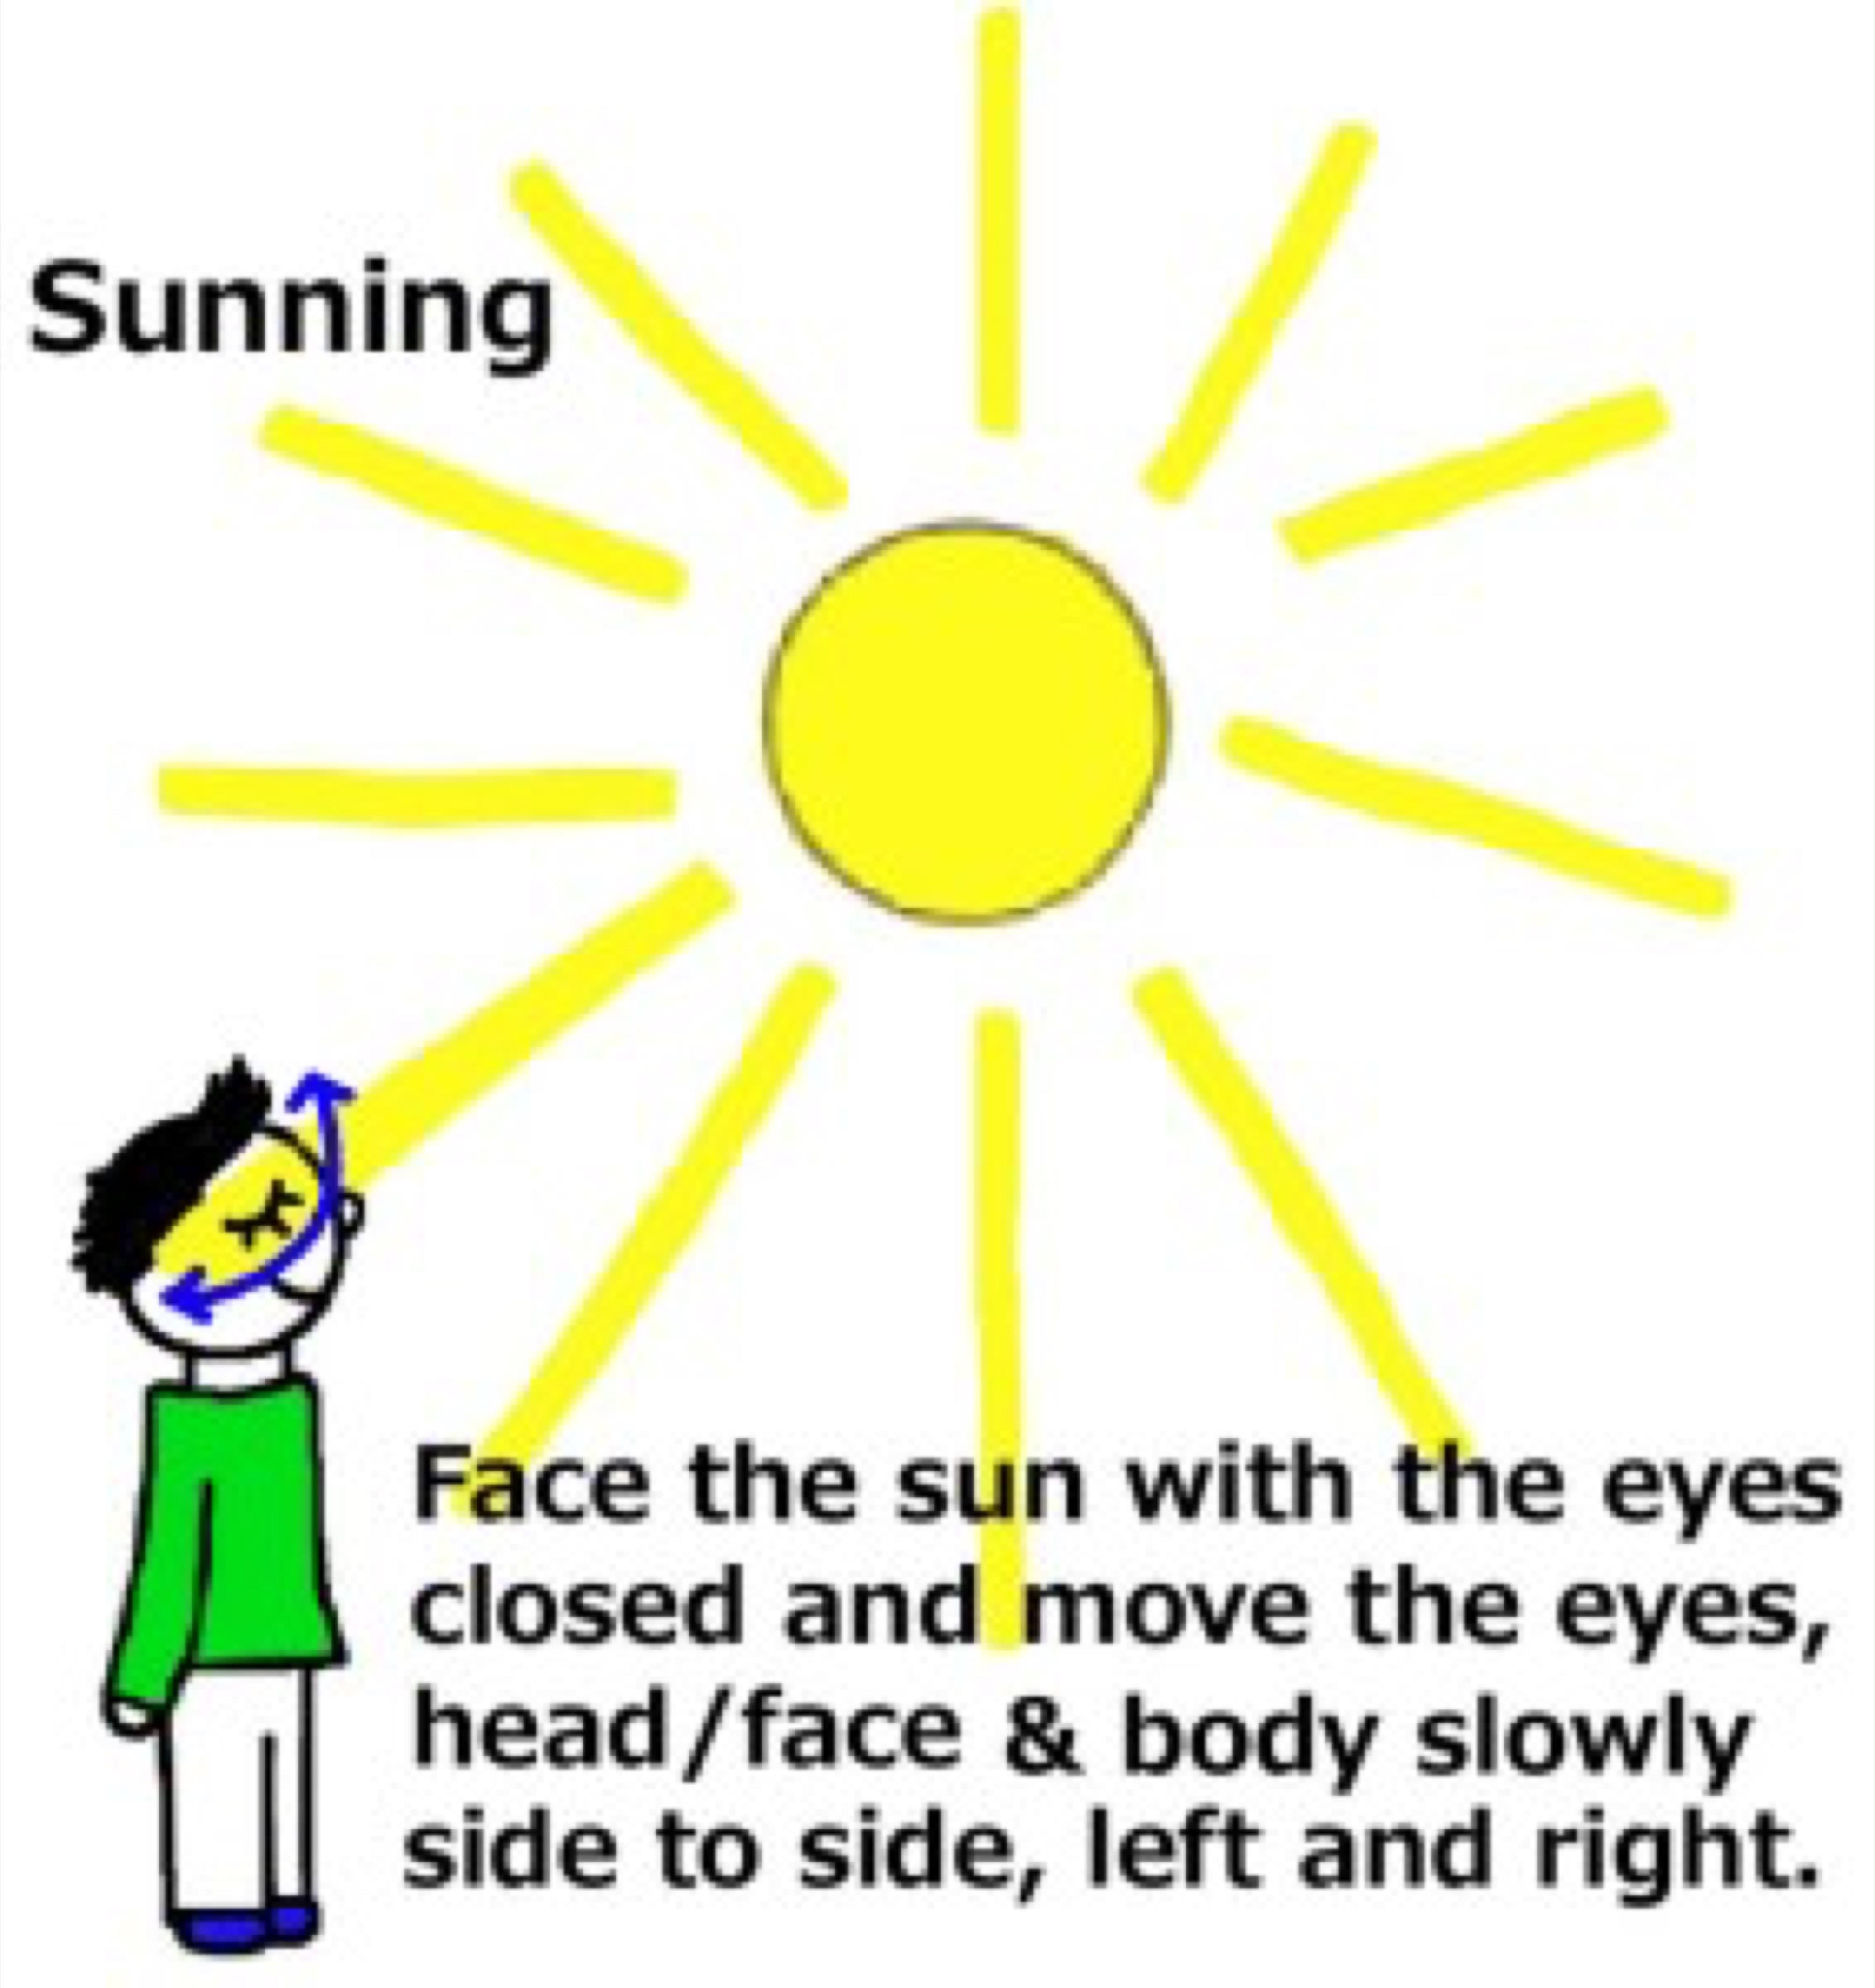 blog image - sunning poster